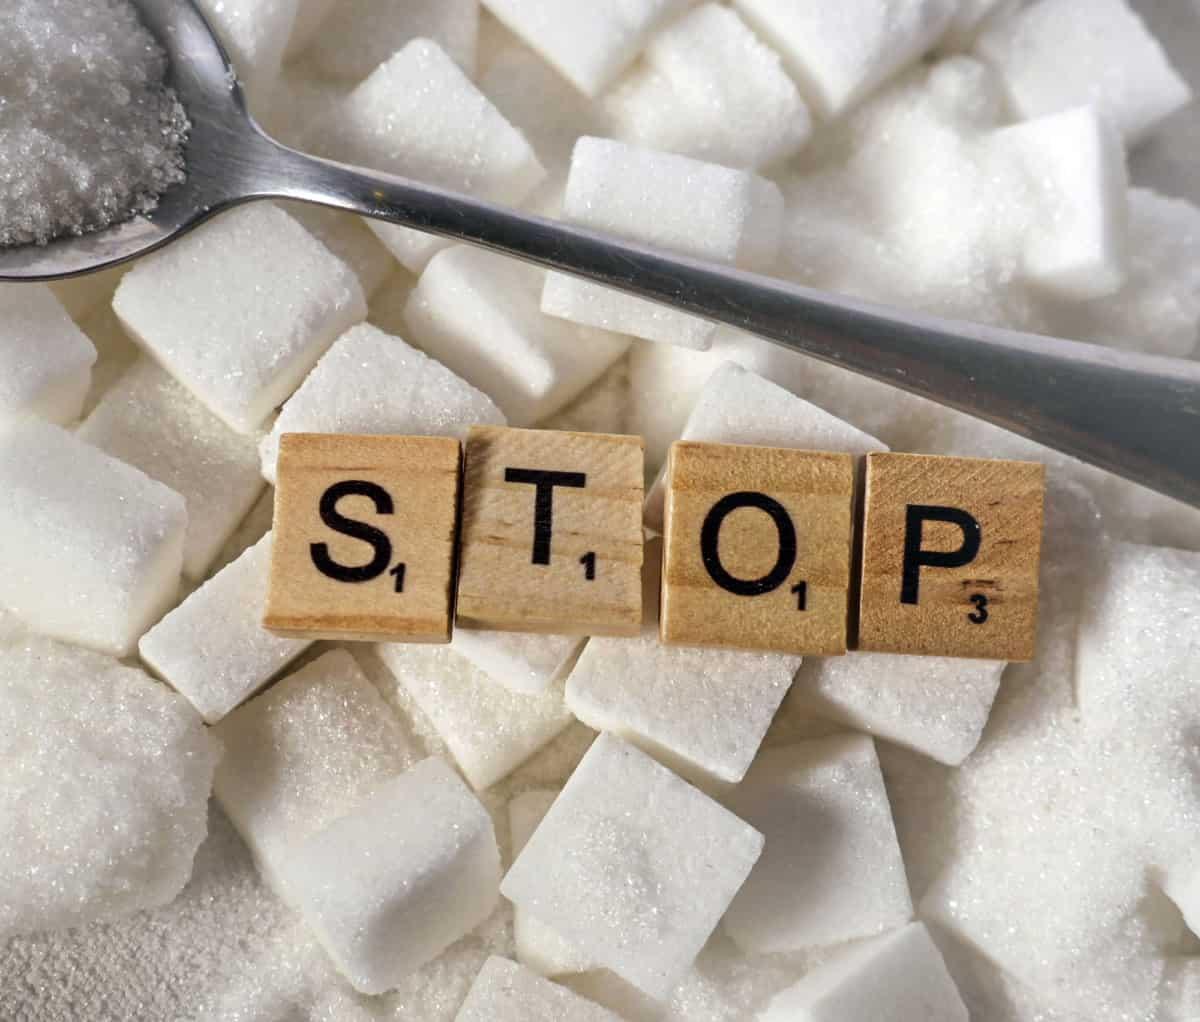 stop eating sugar